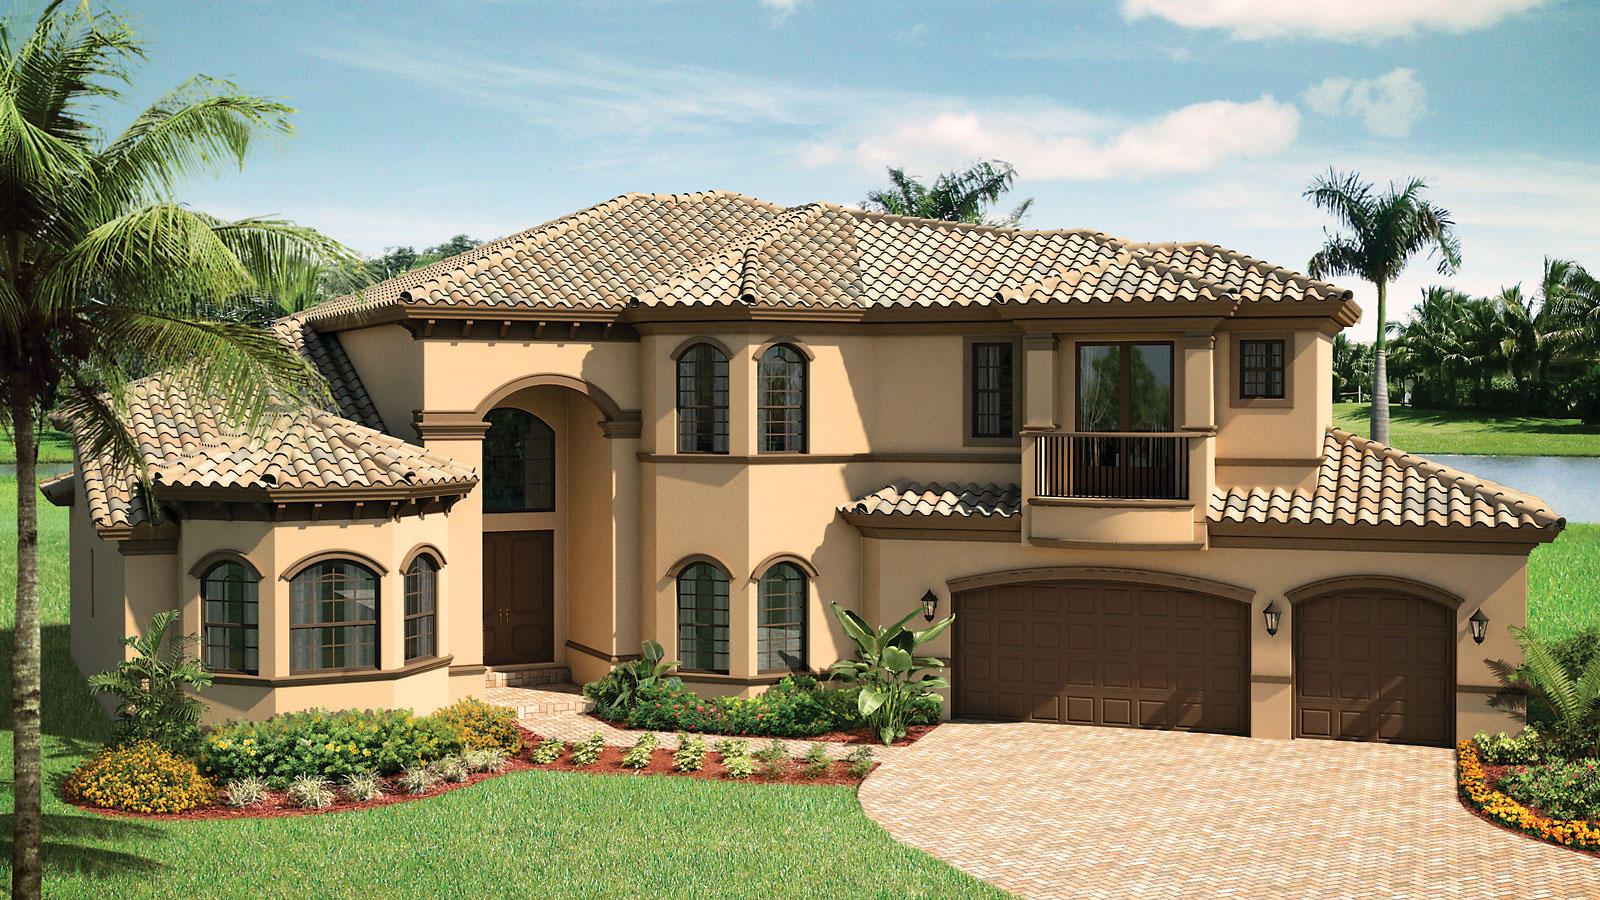 West Palm Beach Fl 33412 1 104 908 Trulia Estimate Refinance Your Home 11084 Rockledge View Dr